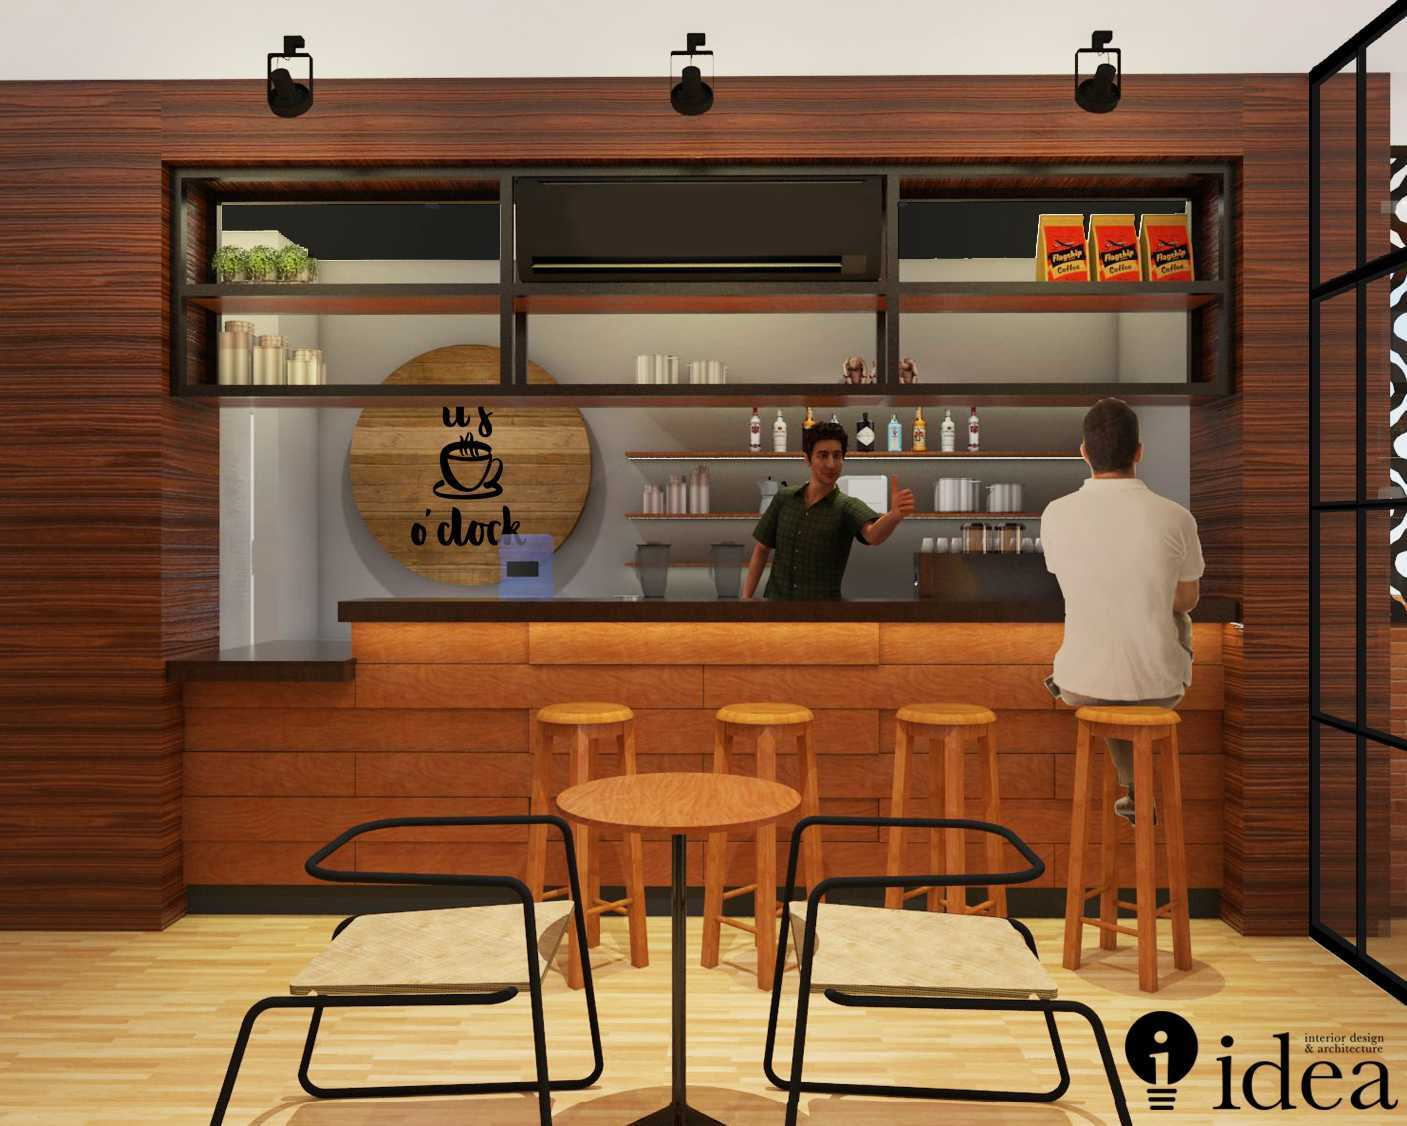 Idea Studio Coffee Bar - Nyonya Attha Surabaya, Kota Sby, Jawa Timur, Indonesia Surabaya, Kota Sby, Jawa Timur, Indonesia Idea-Studio-Coffee-Bar-Nyonya-Attha  79892